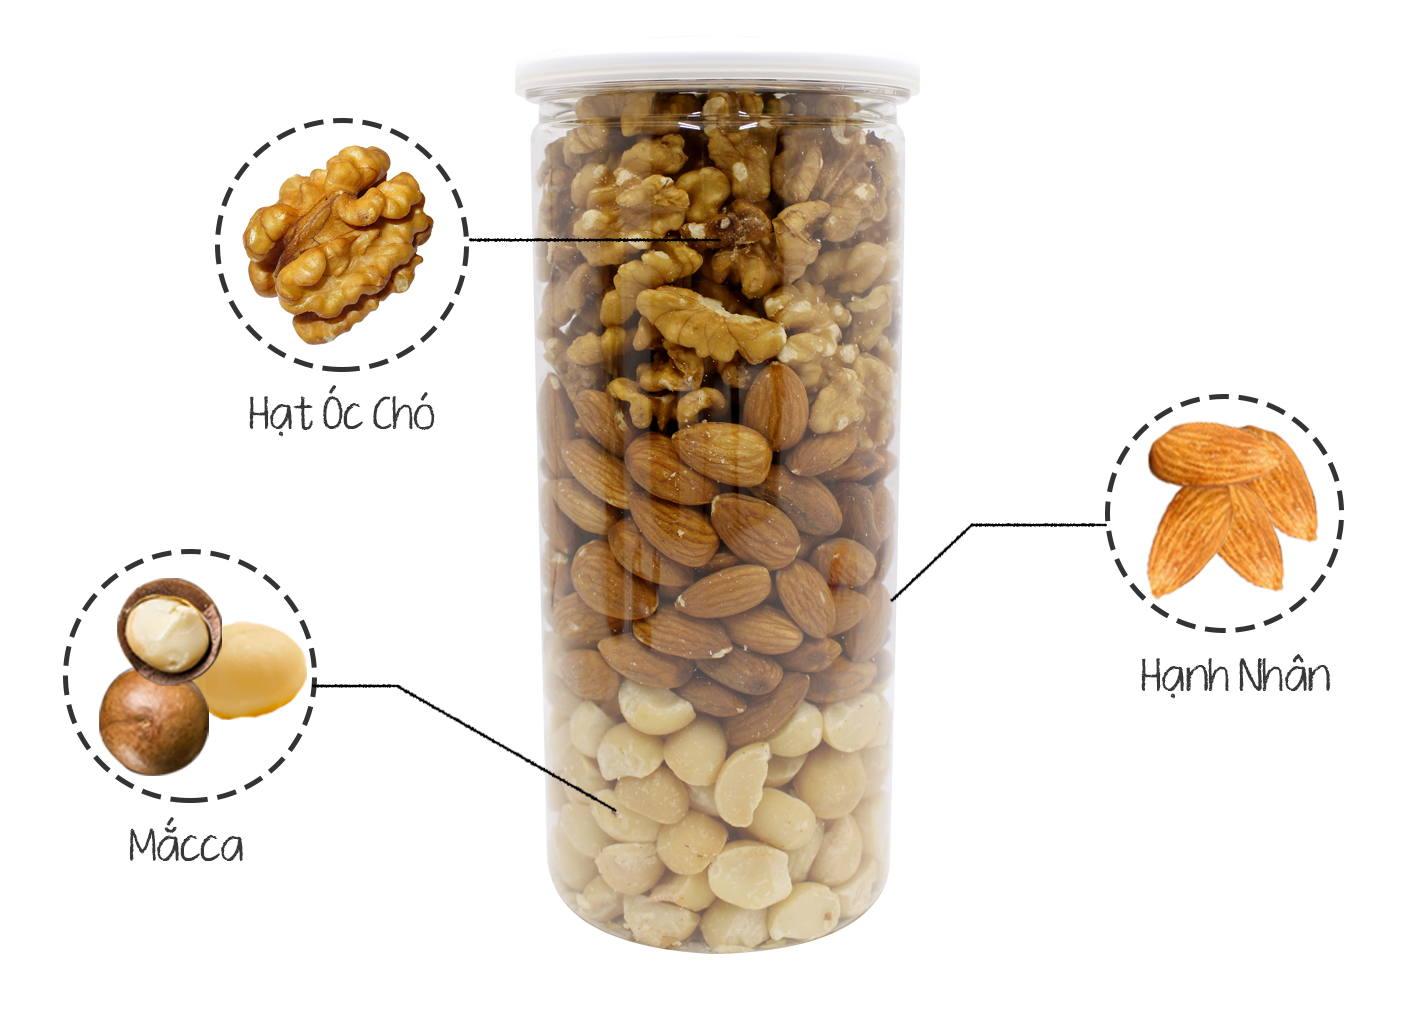 hat mix hanh nhan oc cho macca dk harvest (4)